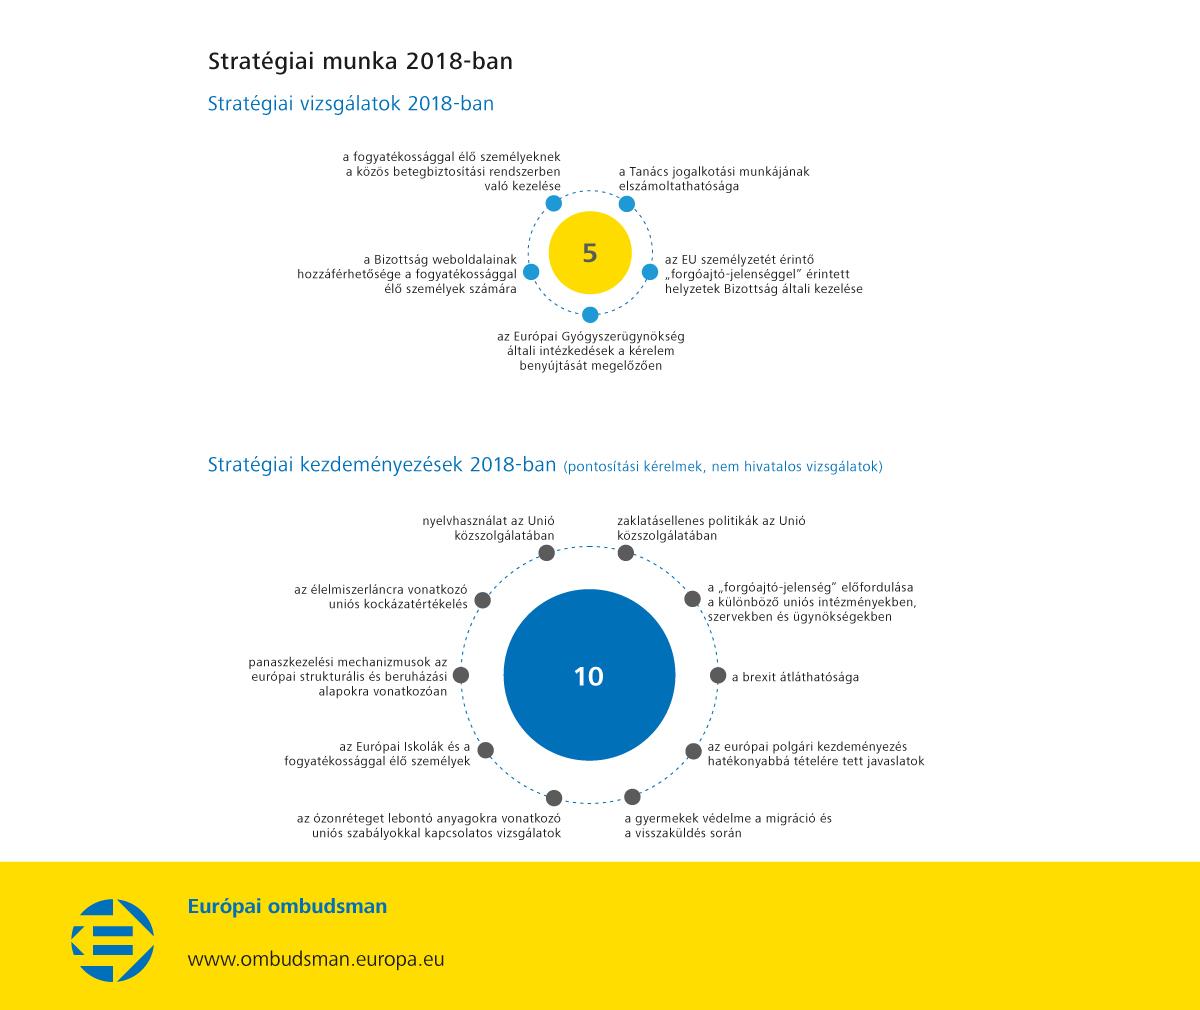 Stratégiai munka 2018-ban